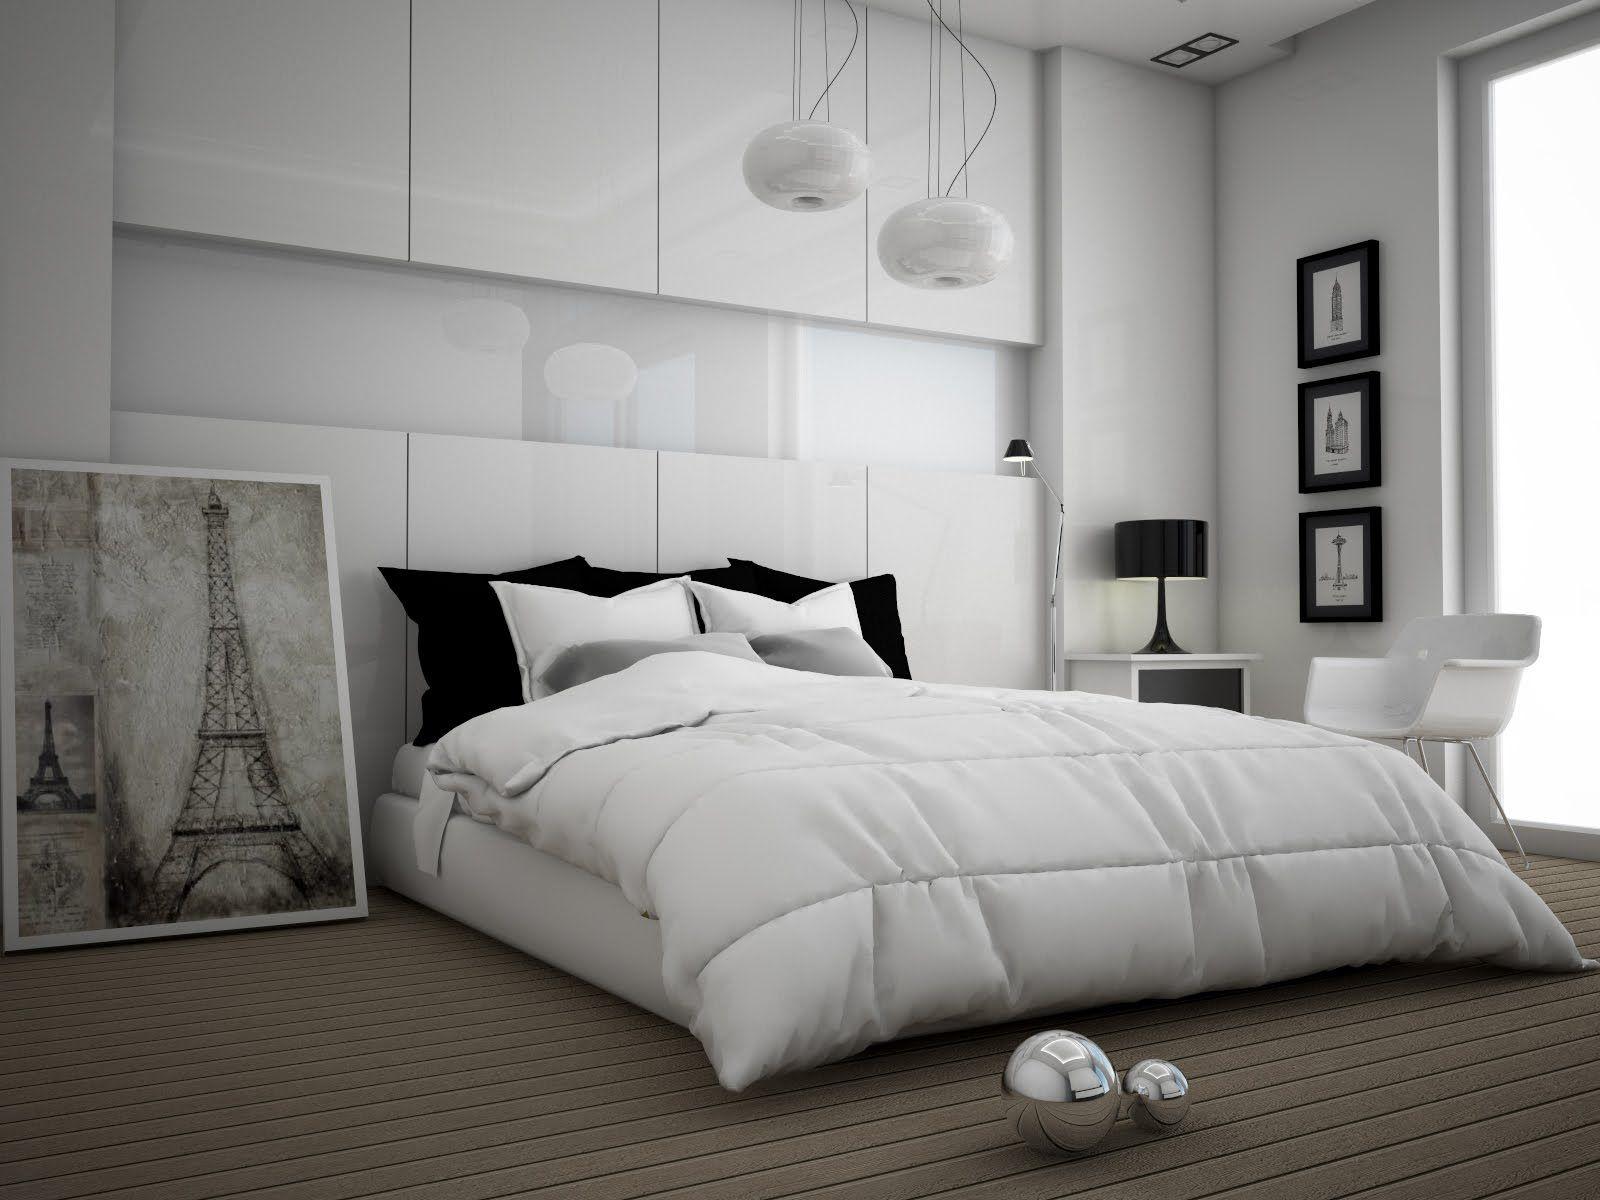 Sketchup Vray Interior Design   Interior Design Images